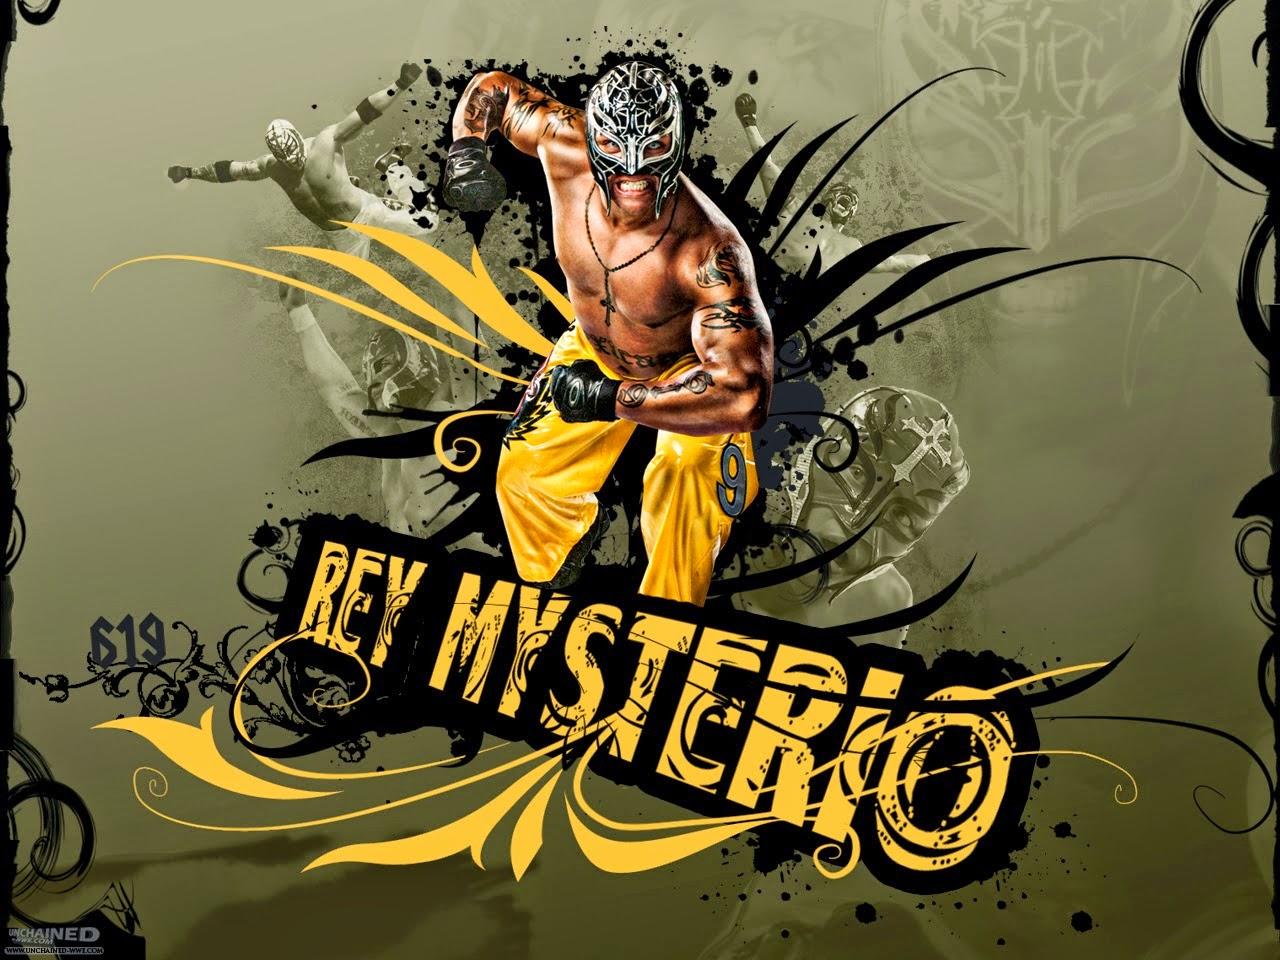 Wwe rey mysterio 619 hd wallpapers wwe wrestling wallpapers - Wwe 619 images ...